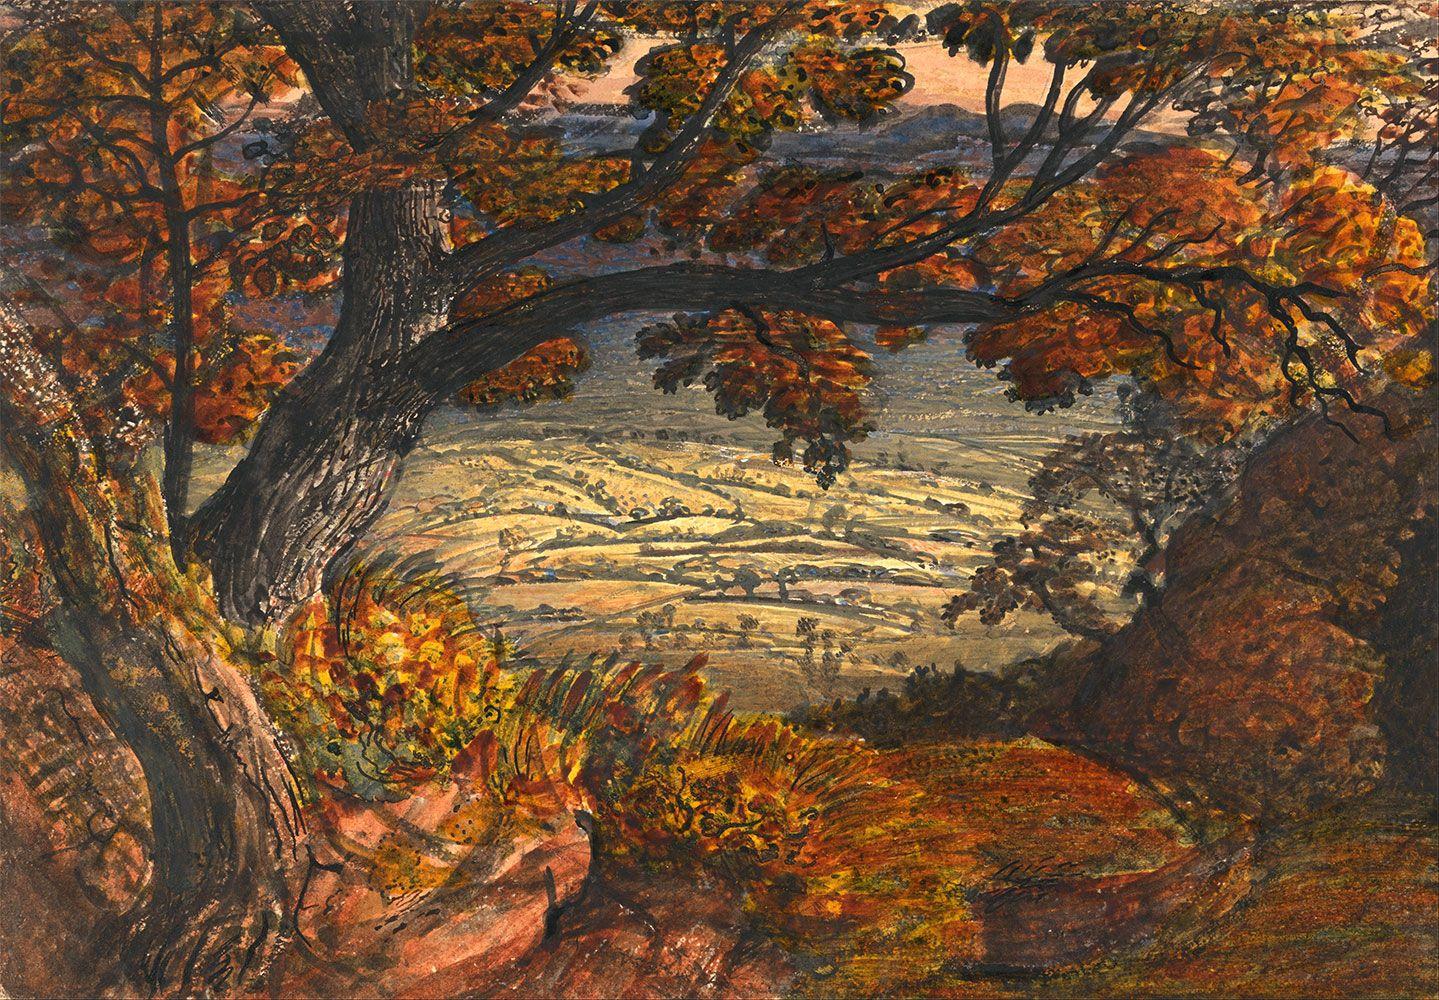 """The Weald of Kent,"" by Samuel Palmer (1833-1834)"